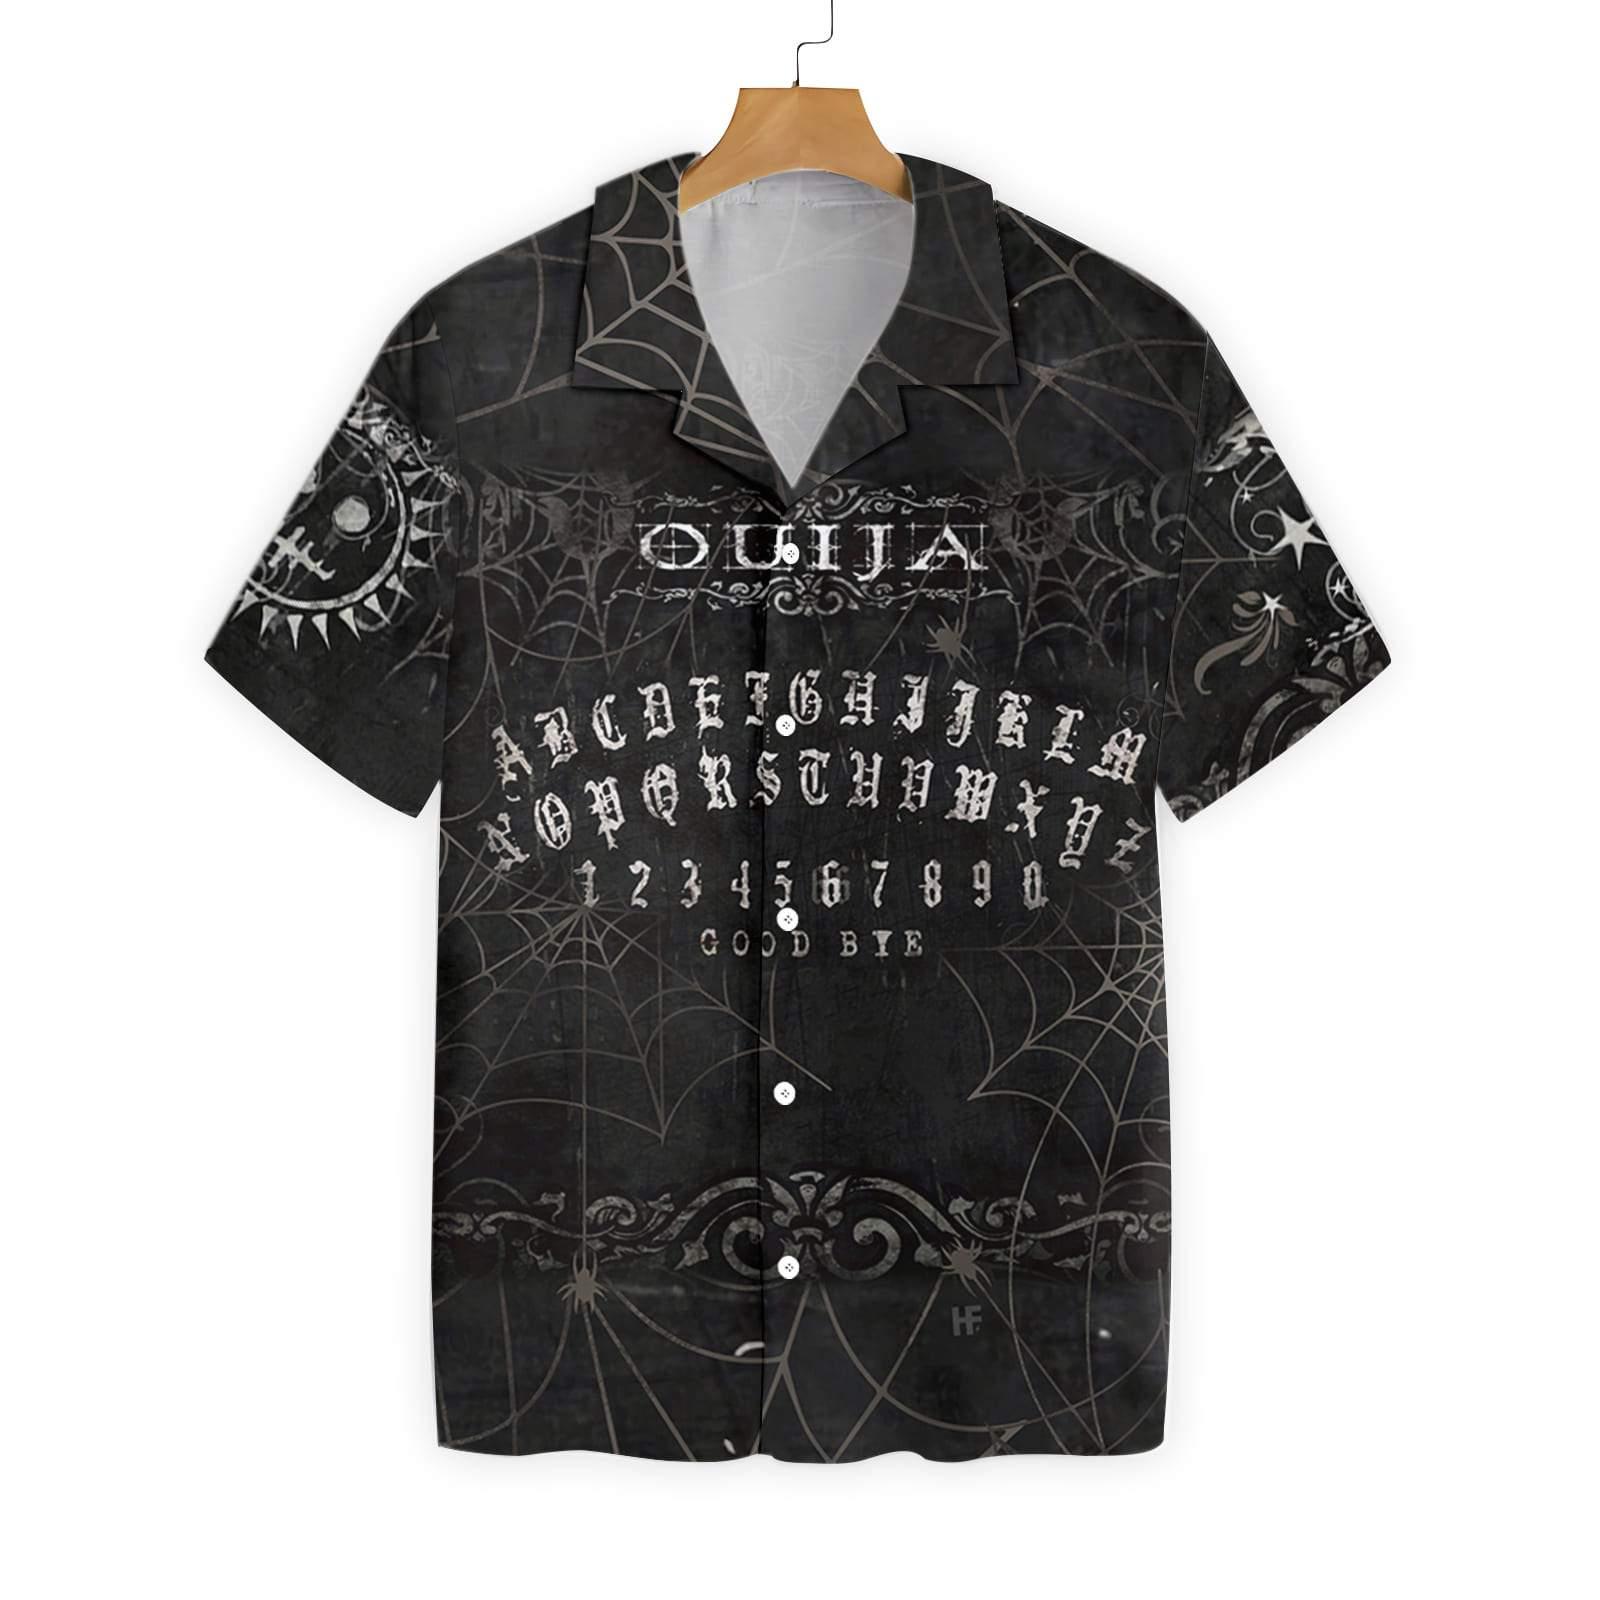 Wicca Ouija Board Good bye Hawaiian Shirt